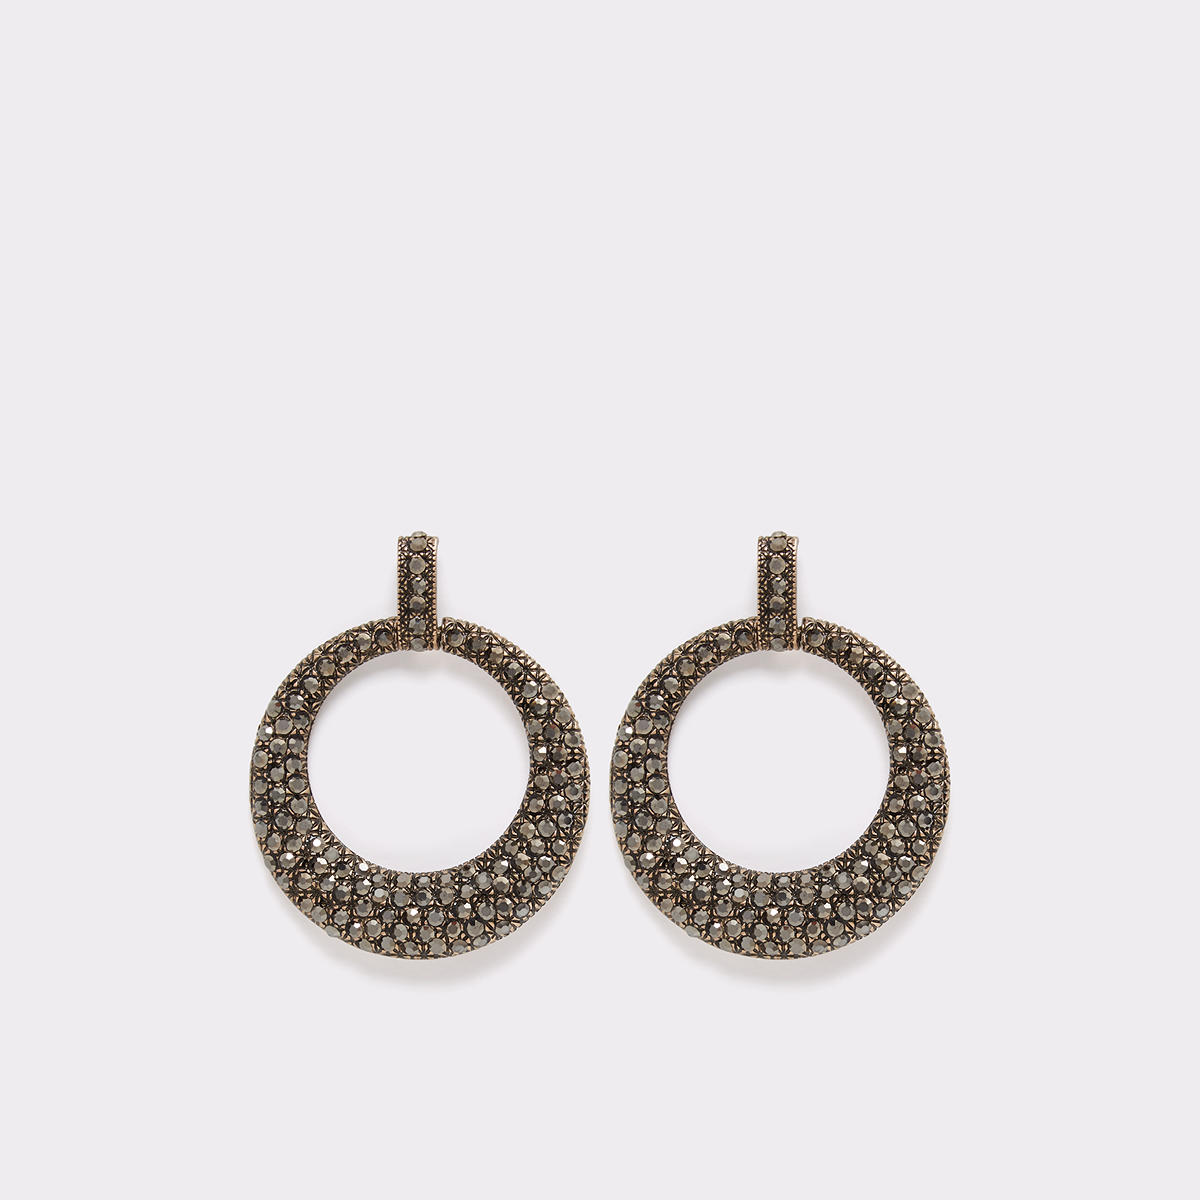 Spittal Light Grey Women's Earrings | ALDO US at Aldo Shoes in Victor, NY | Tuggl